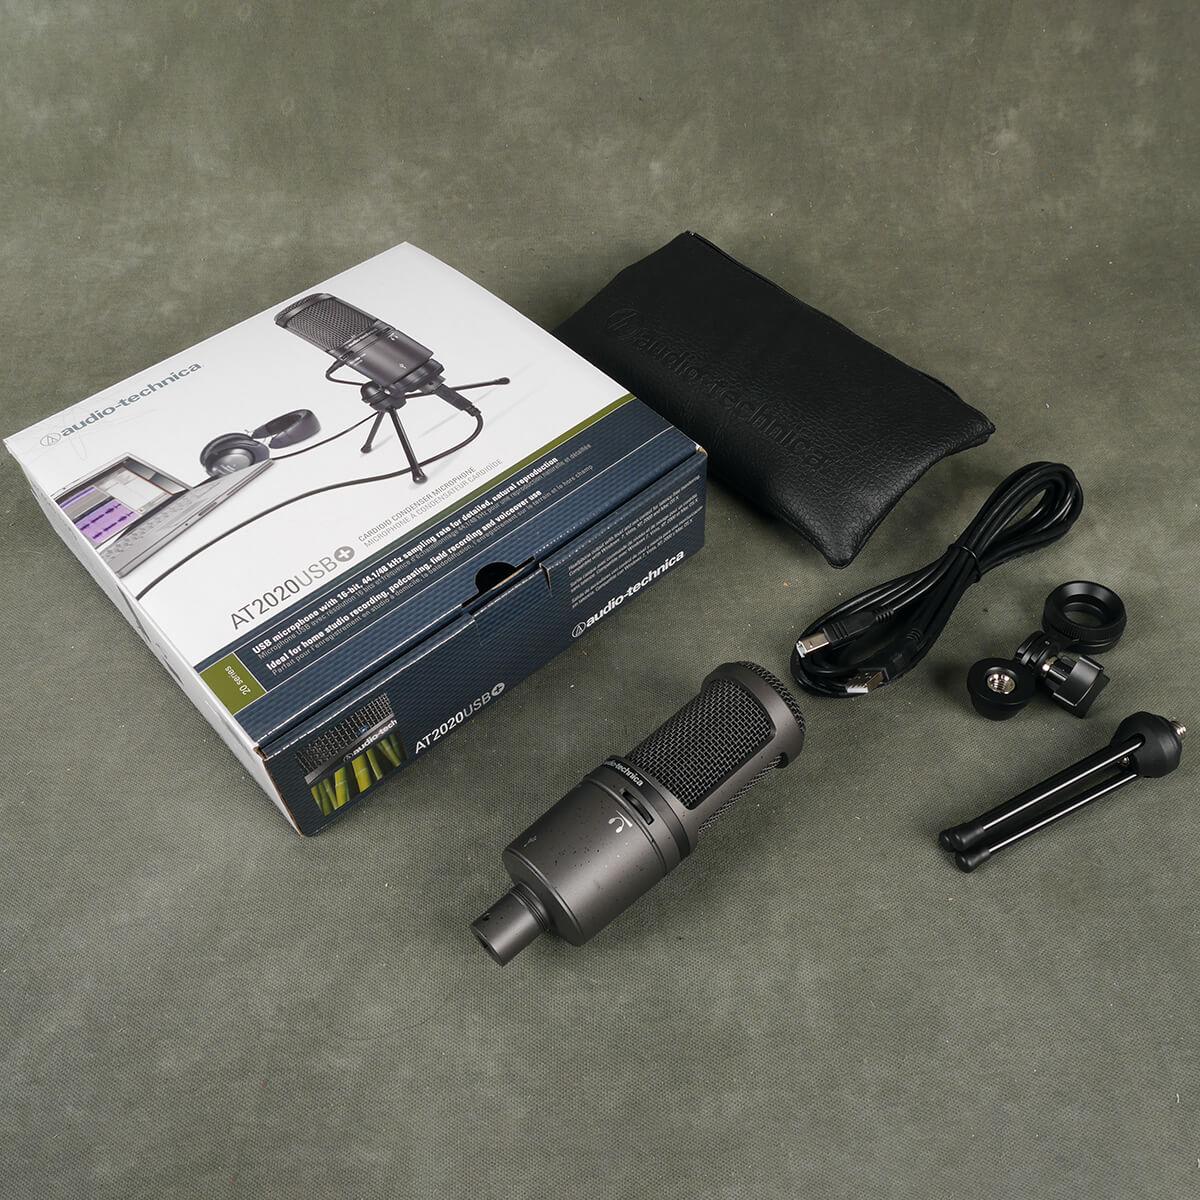 Audio Technica 2020+ USB Condenser Microphone w/Box - 2nd Hand